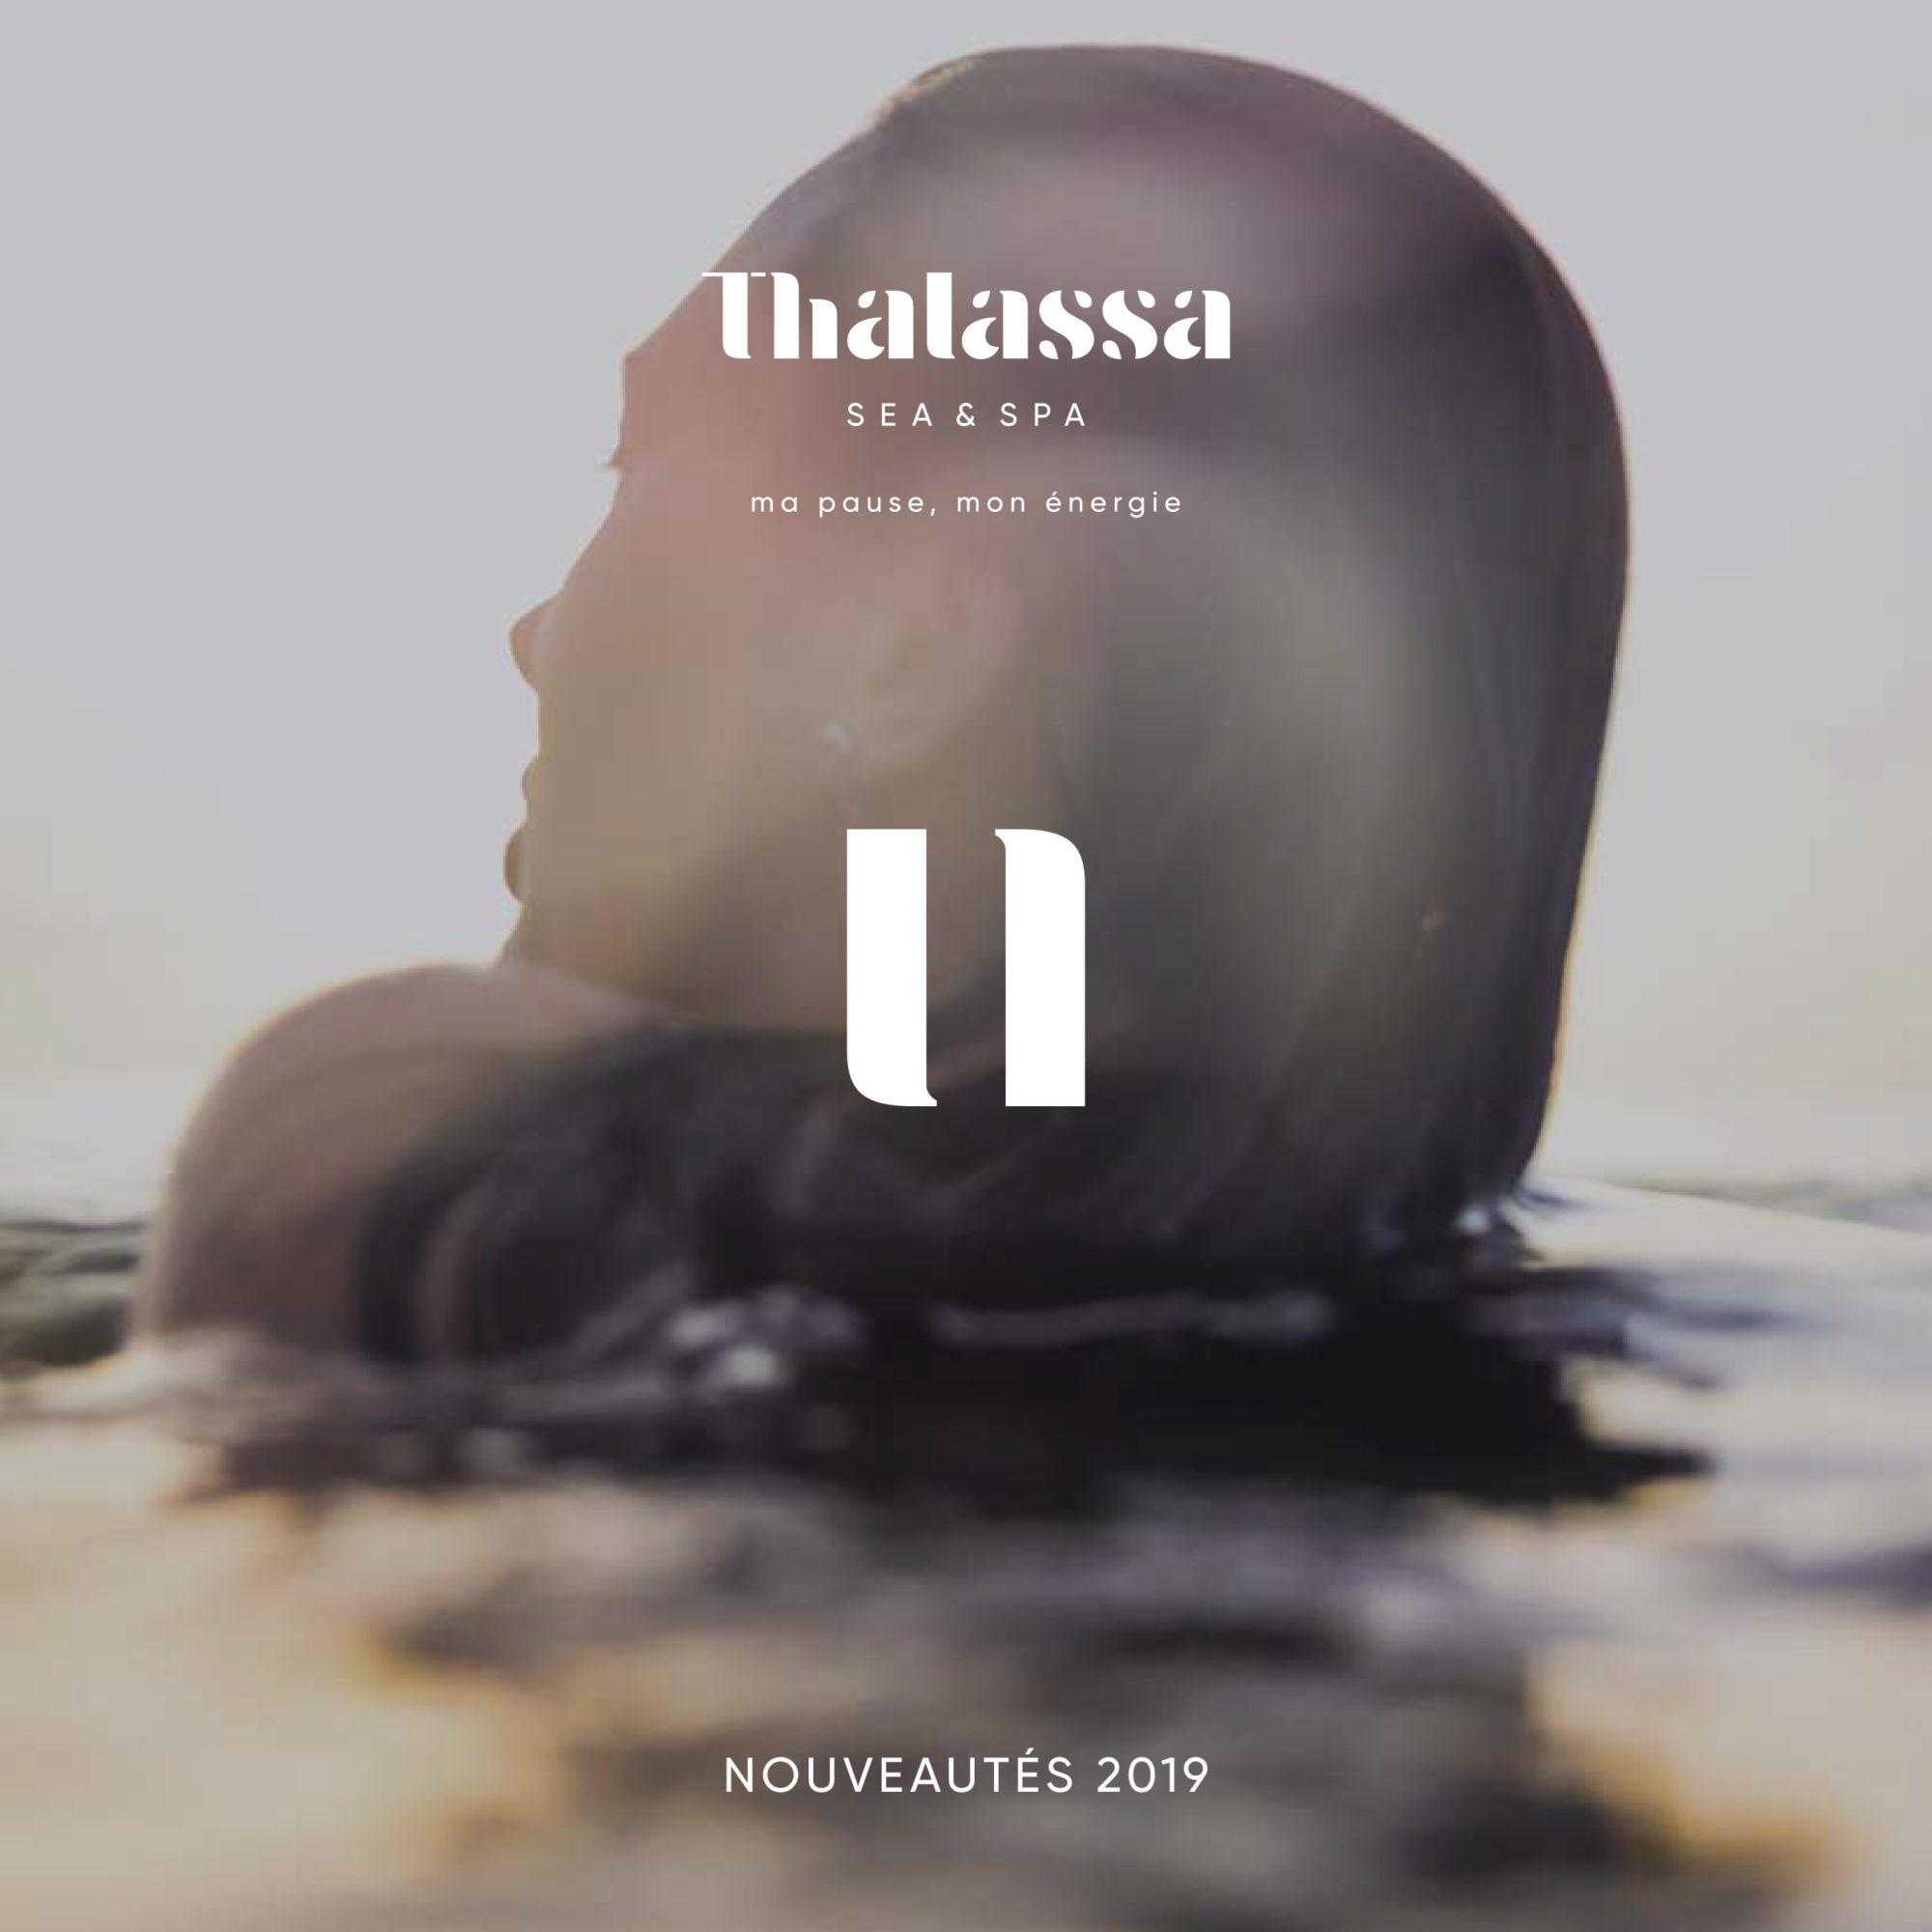 Dossier de presseThalassa Sea & Spa